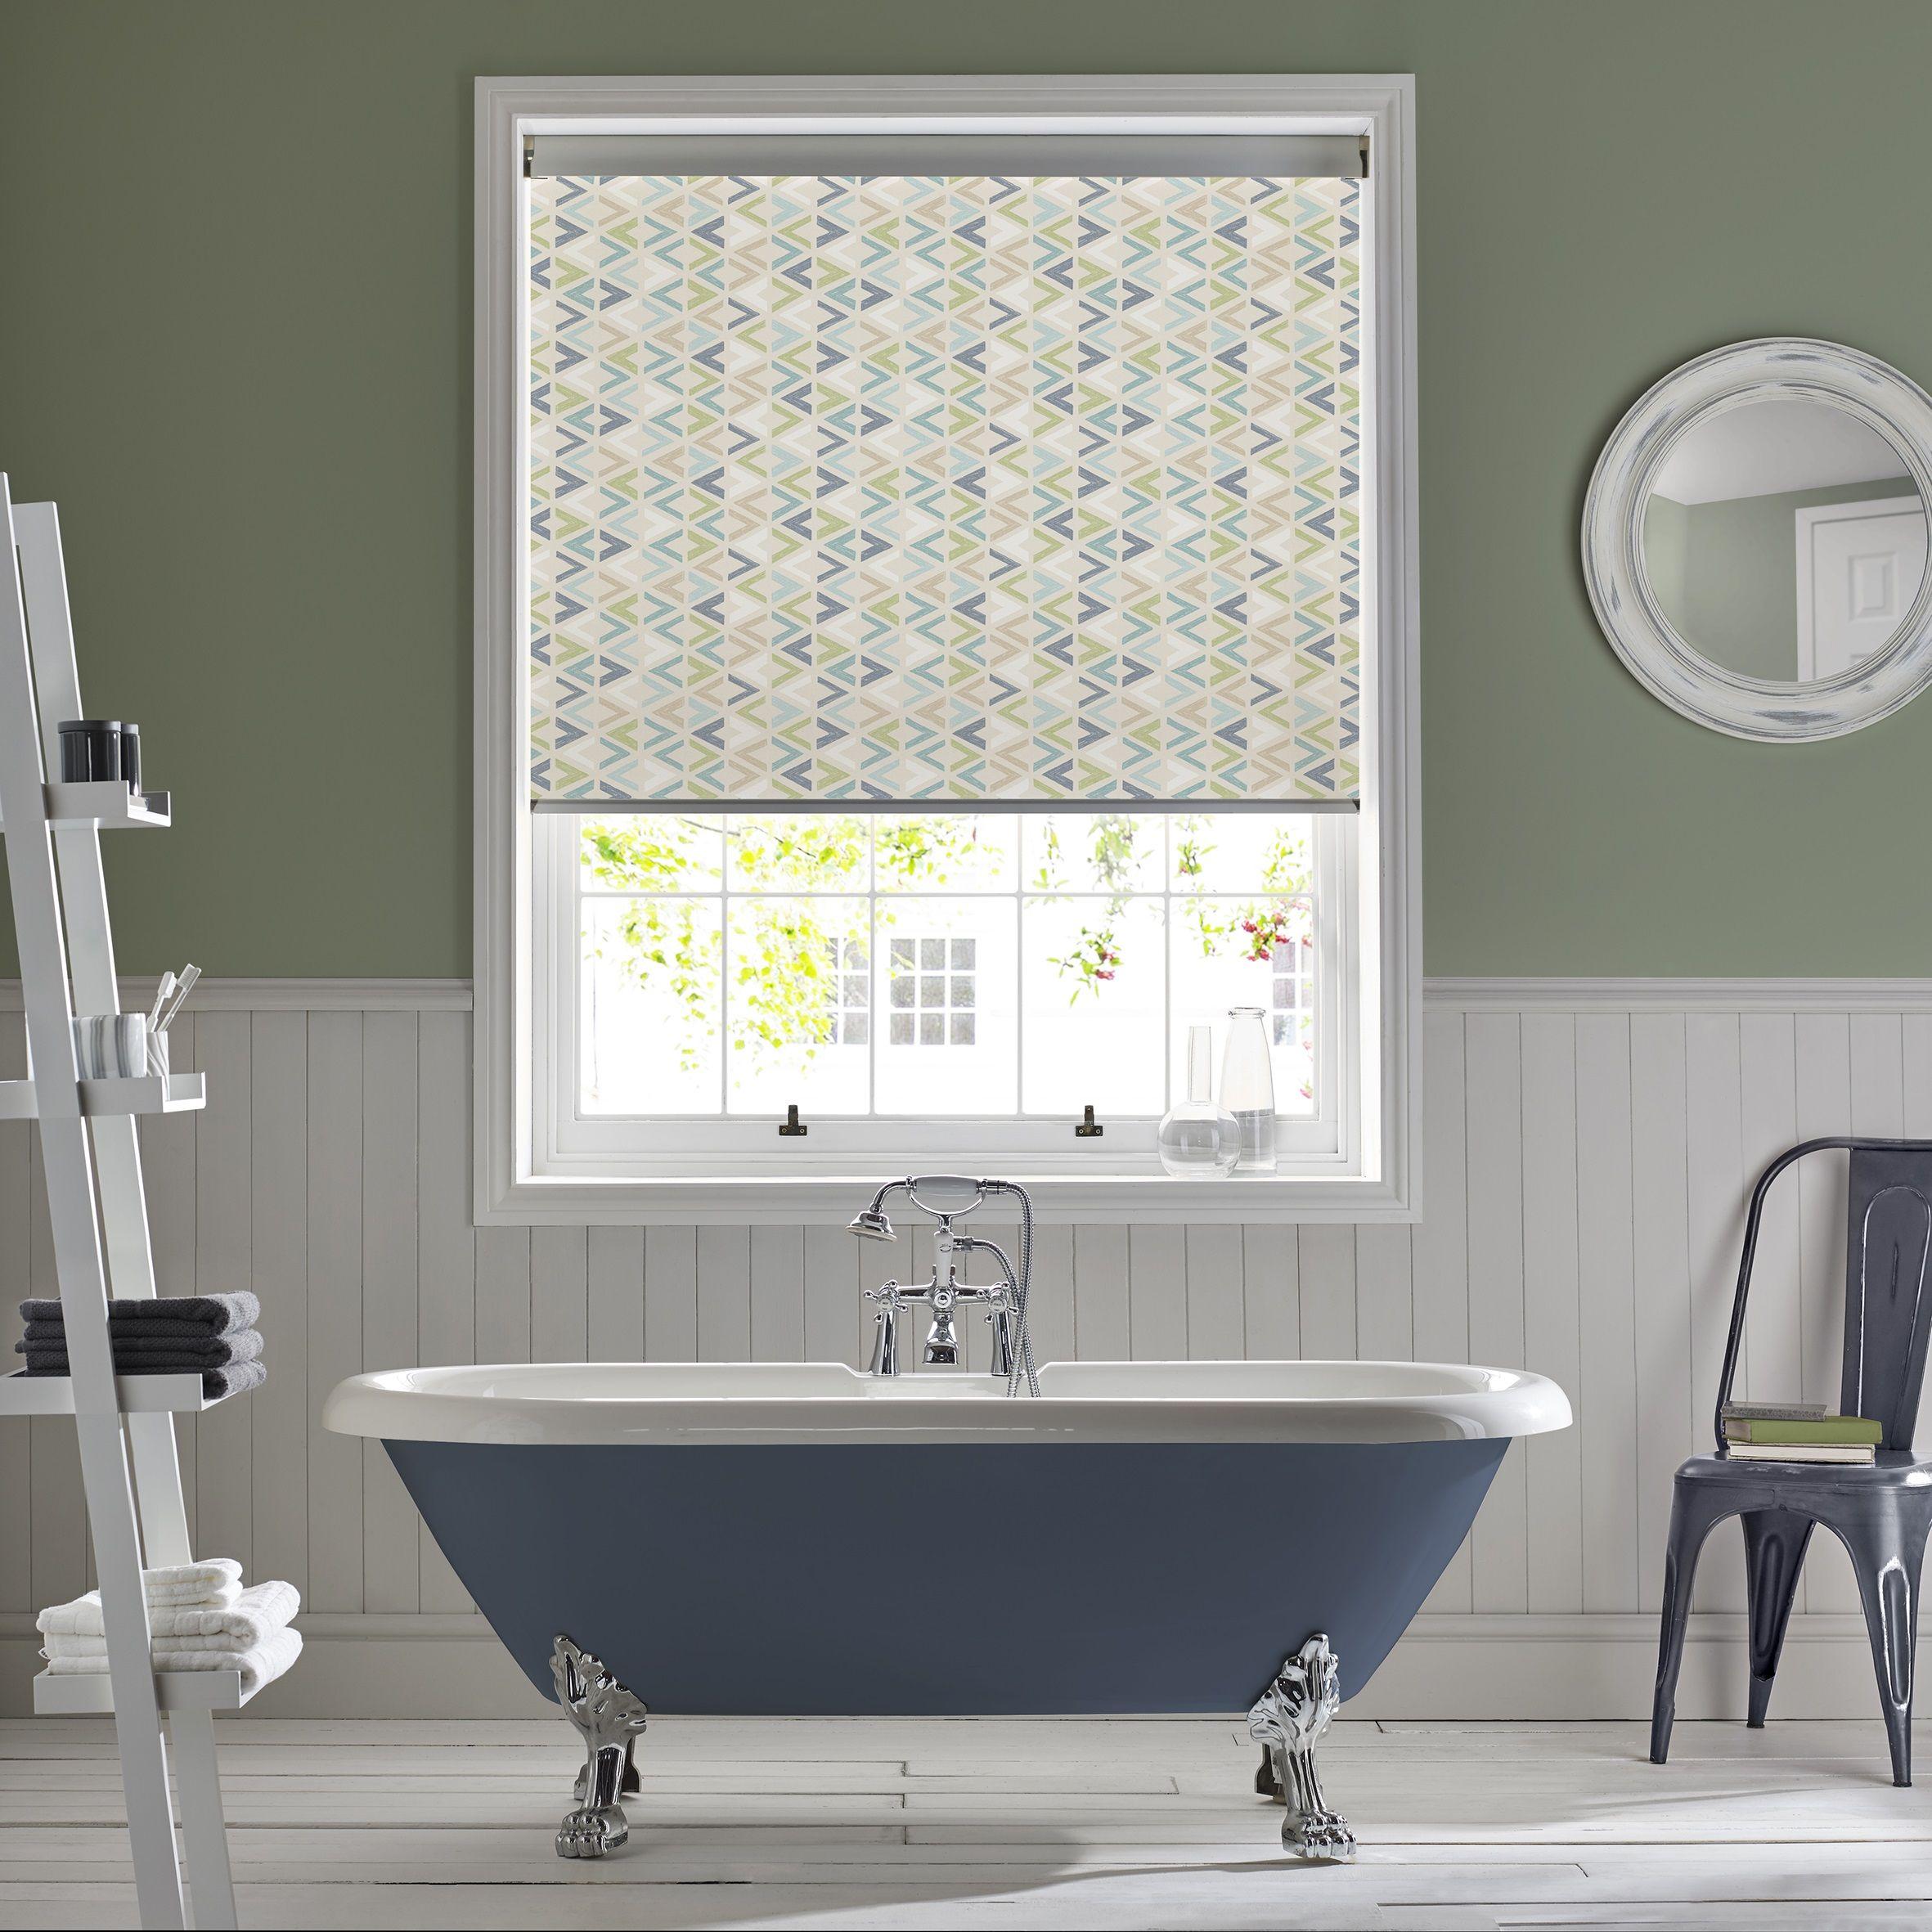 Azzura Aqua Bathroom Roller Blind By Style Studio. Contemporary Blue Colour  Inspiration For The Bathroom